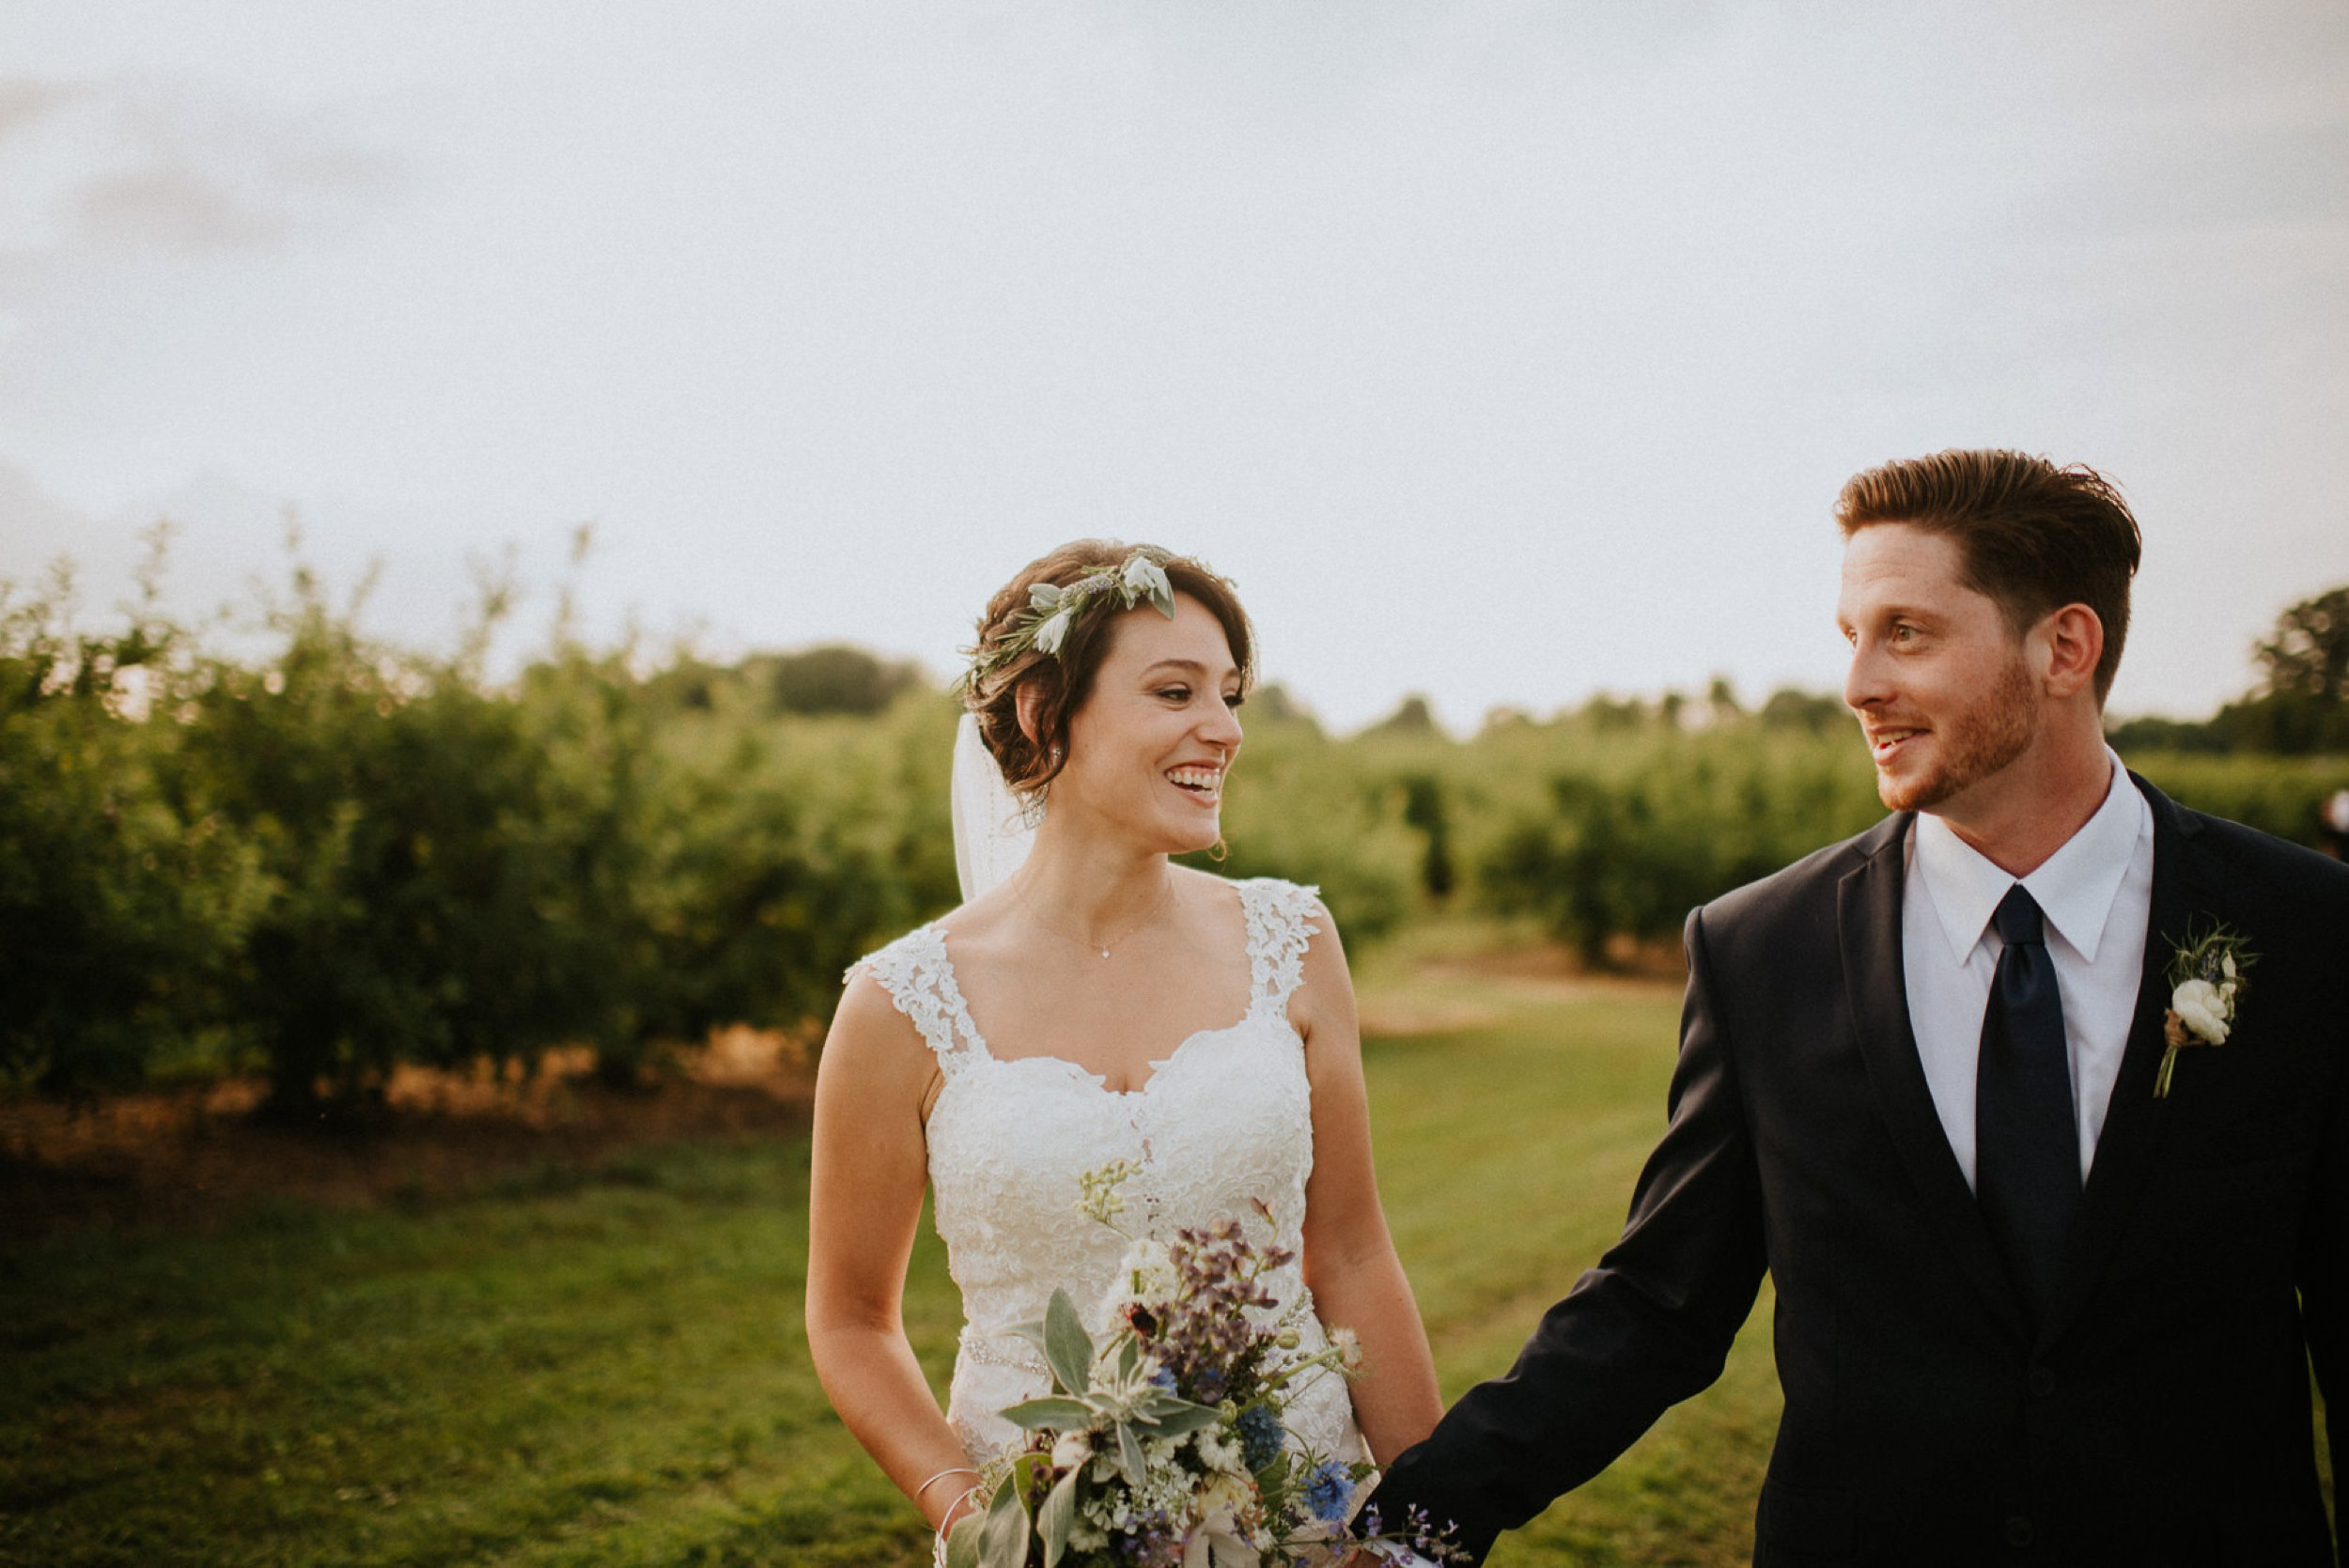 milburn_farms-wedding-69.jpg